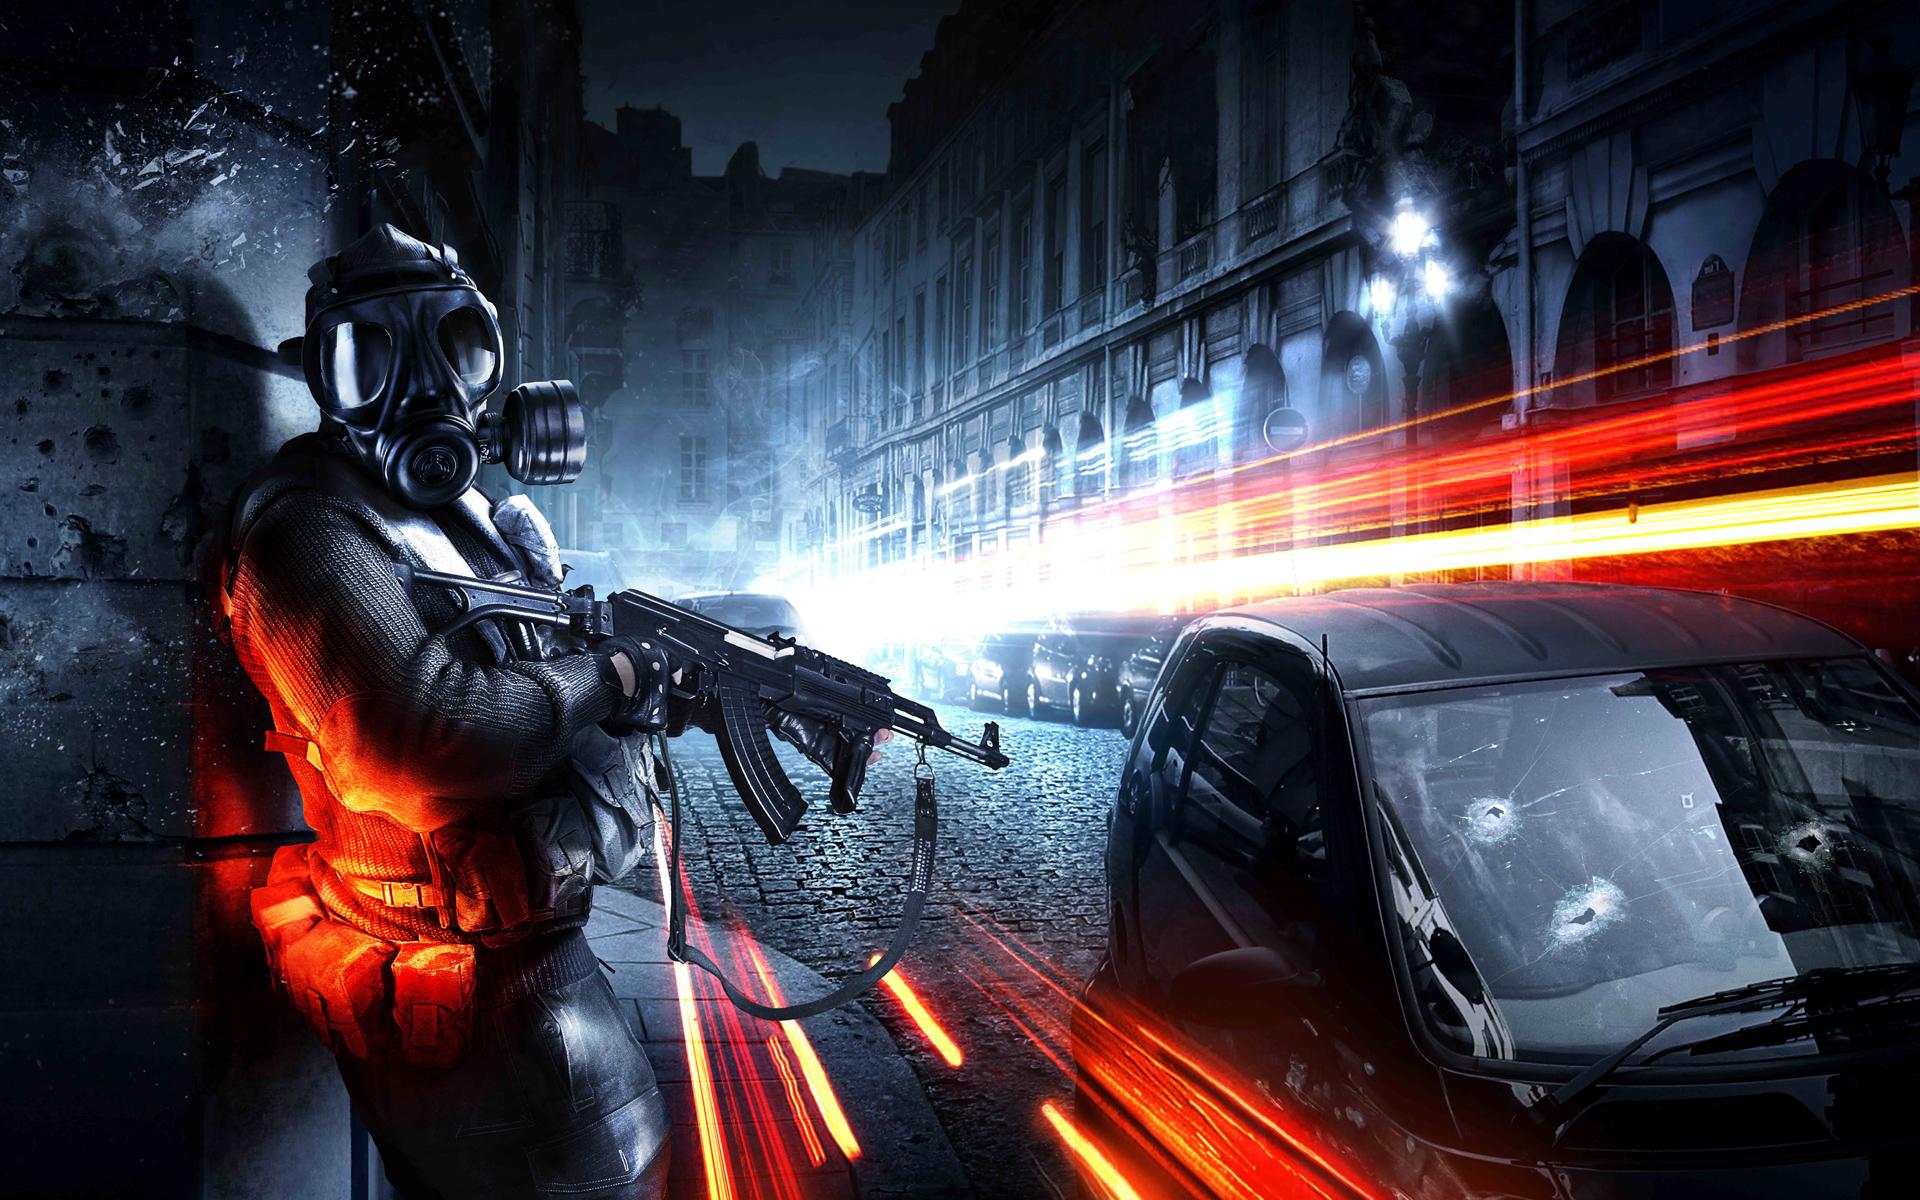 2011 Battlefield 3 Game Wallpapers HD Wallpapers 1920x1200